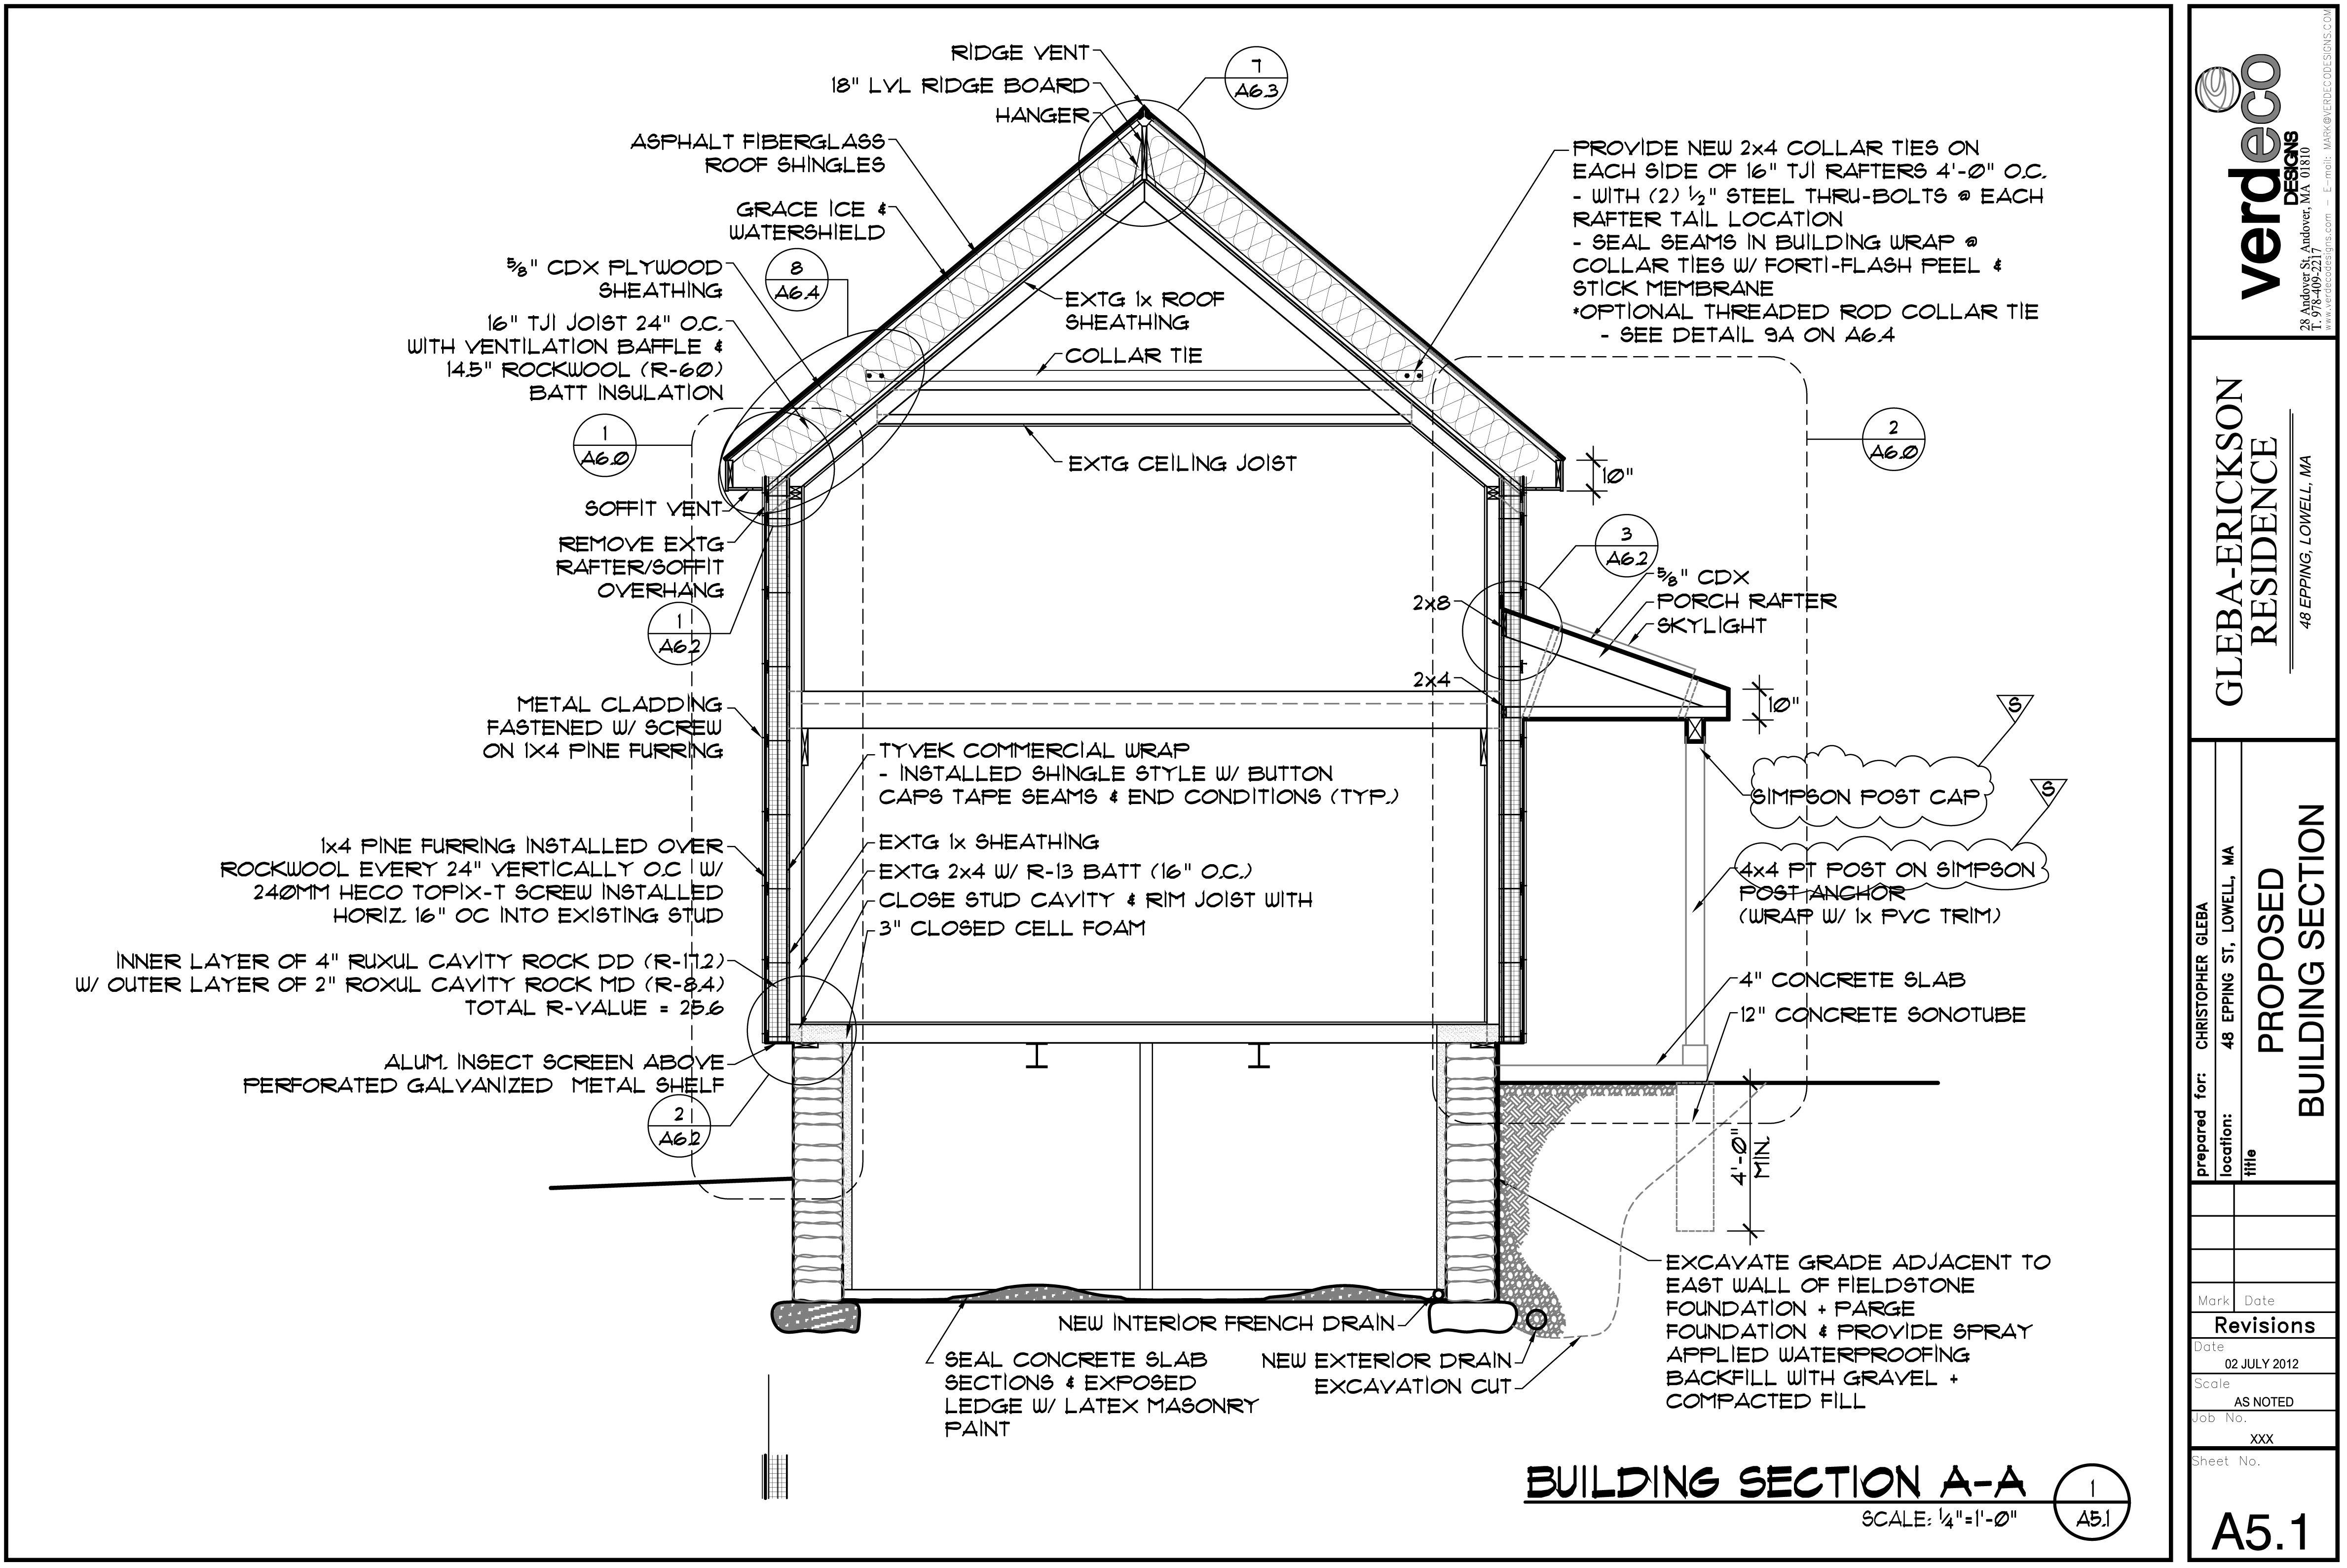 Exterior Insulation Plan